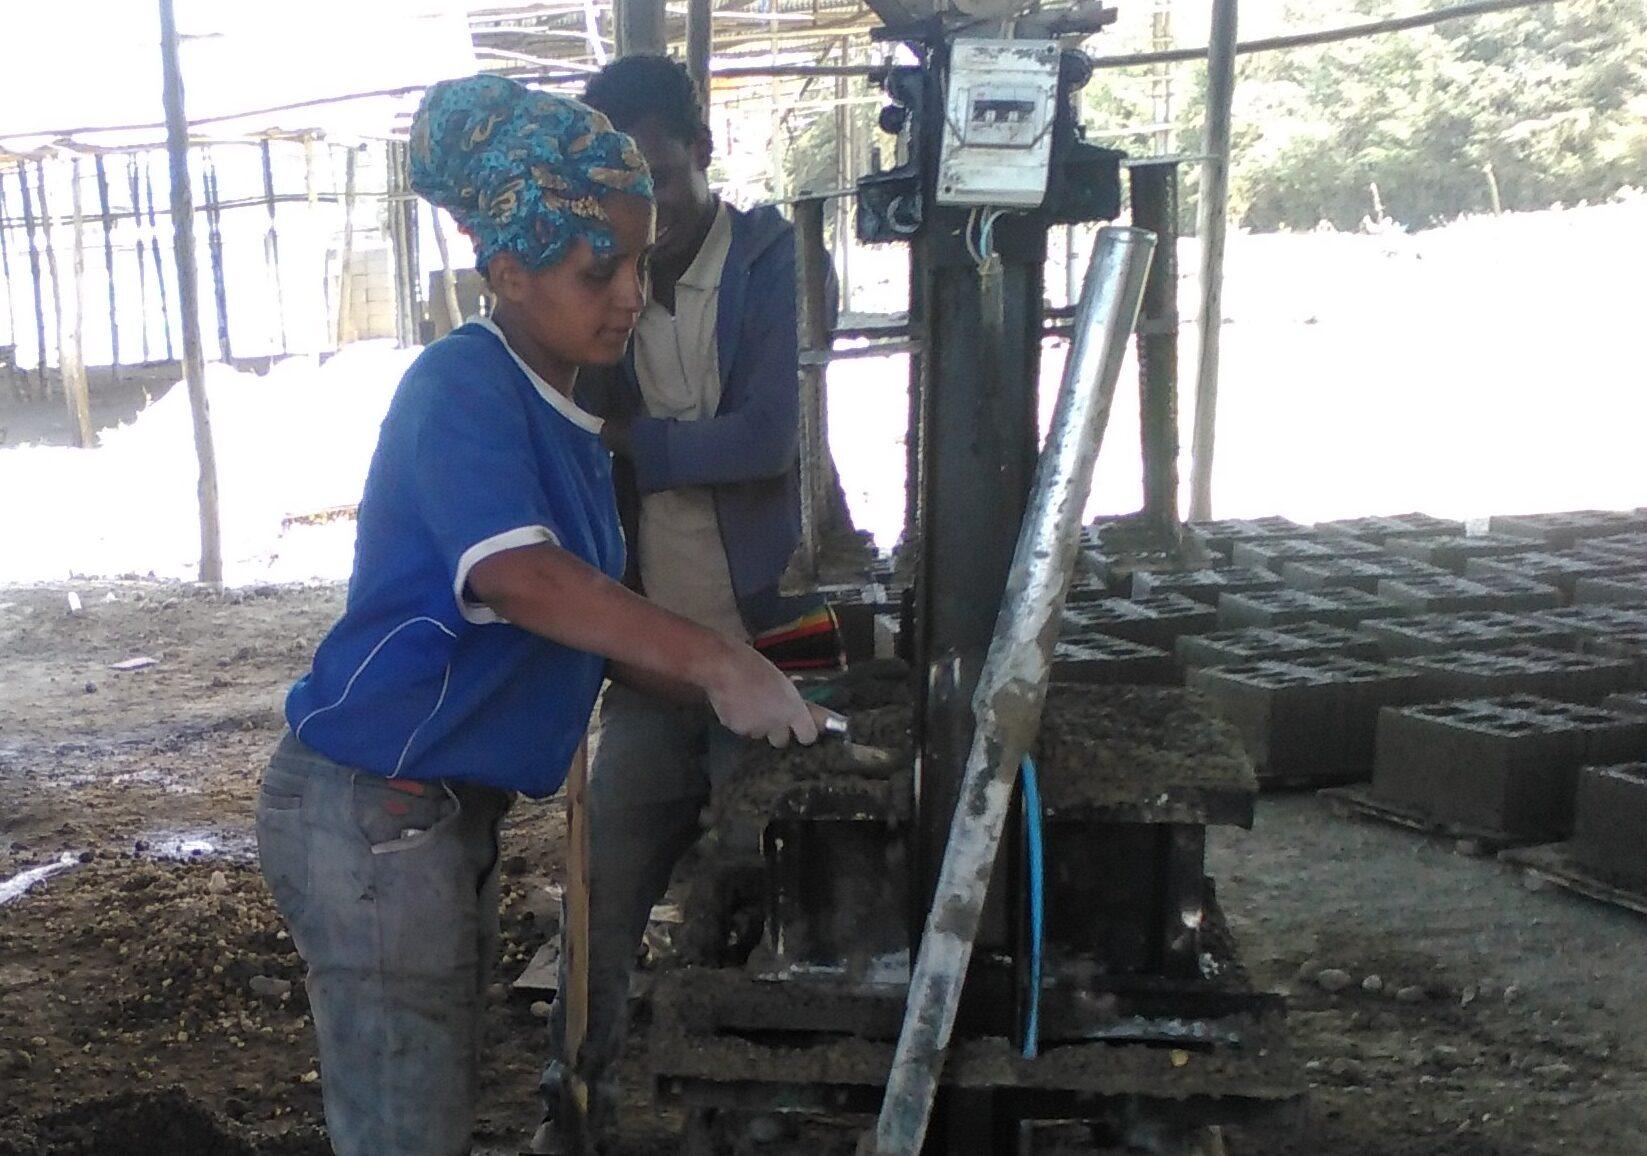 Haimanot Yirsaw, 22, lives in Debrebirhan of North Shoa in the Amhara Regional State